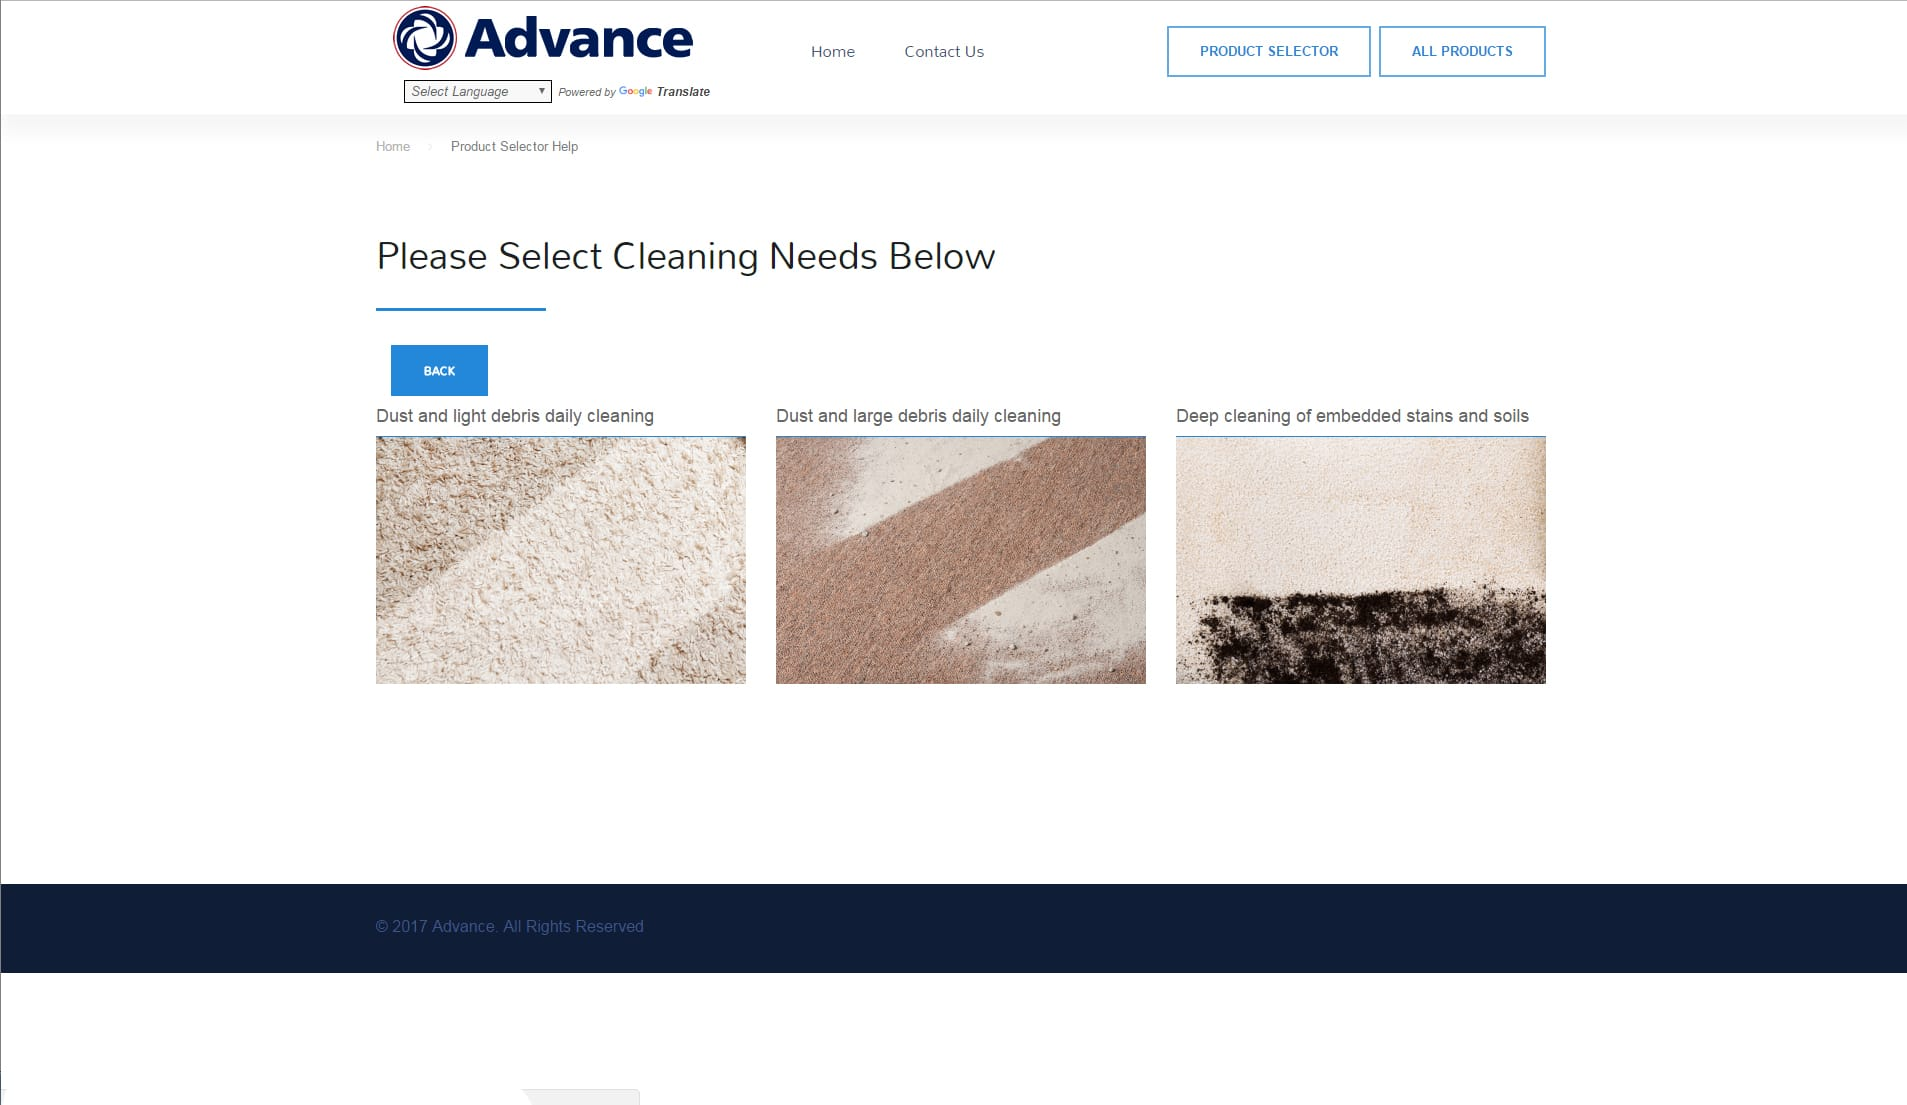 Mr.Tutor-Tech Website Design Milton Advance Products Website Design Slide 4